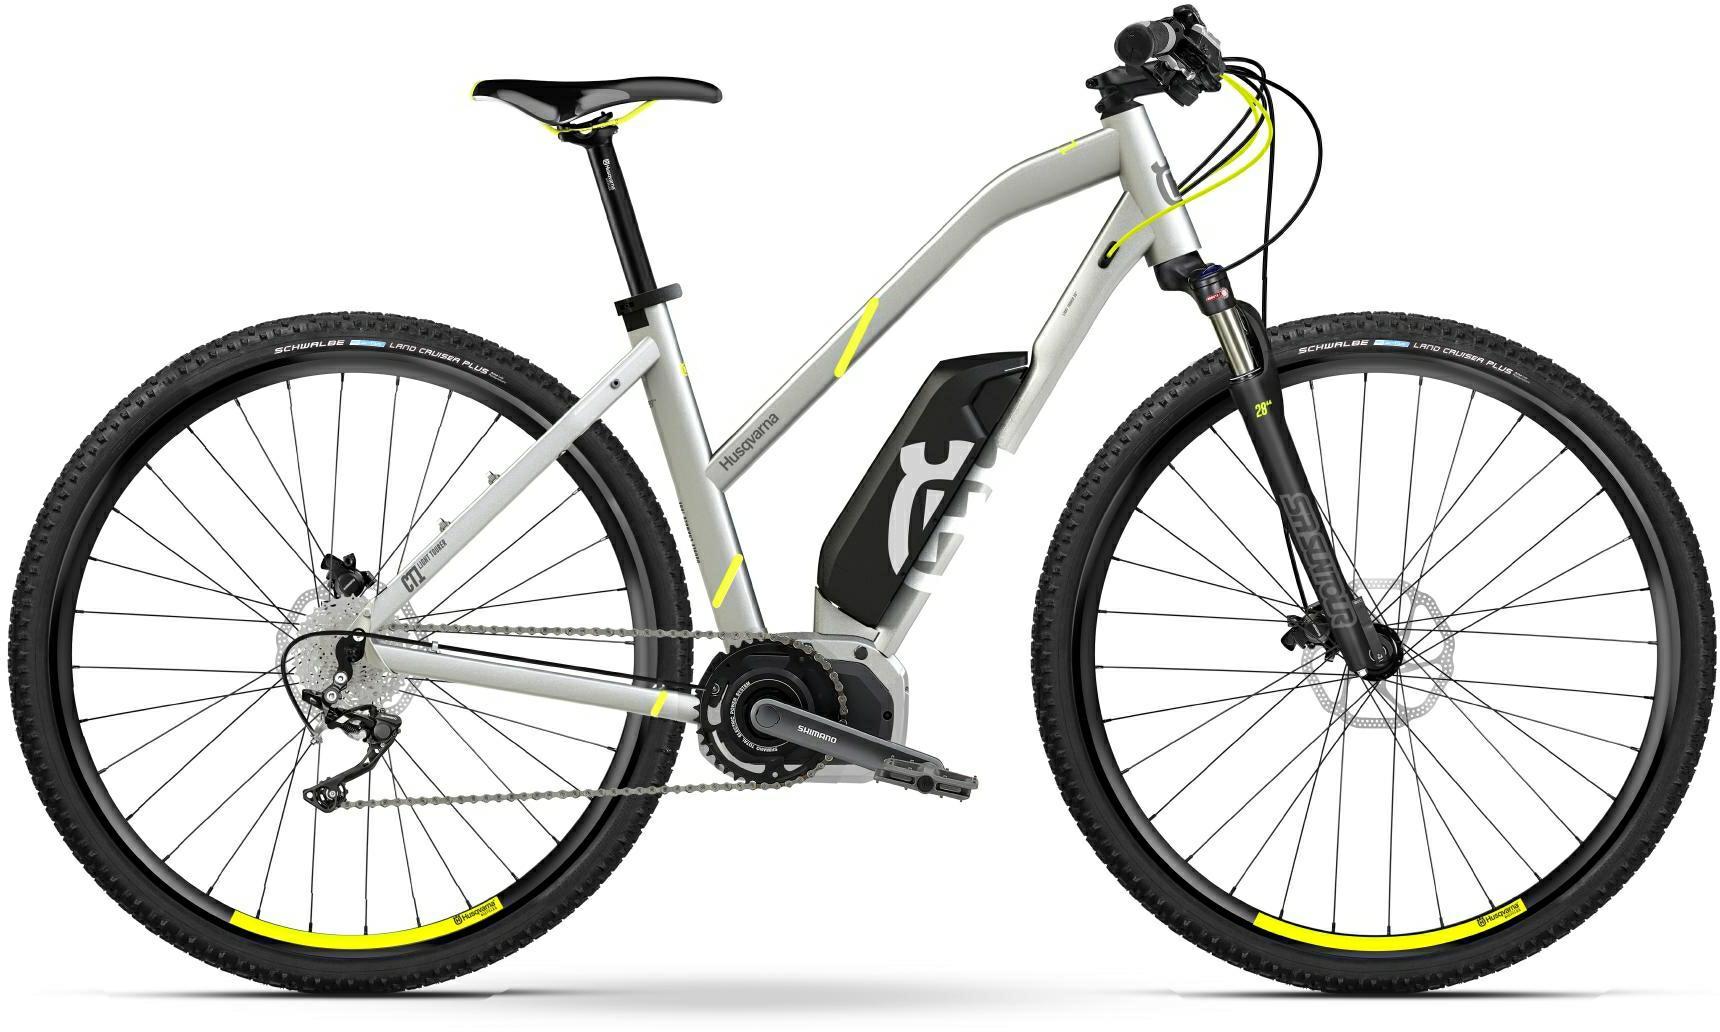 Husqvarna Cross Tourer CT1 e-Mountainbike, MTB Pedelec 2018 silber/gelb Trapezrahmen